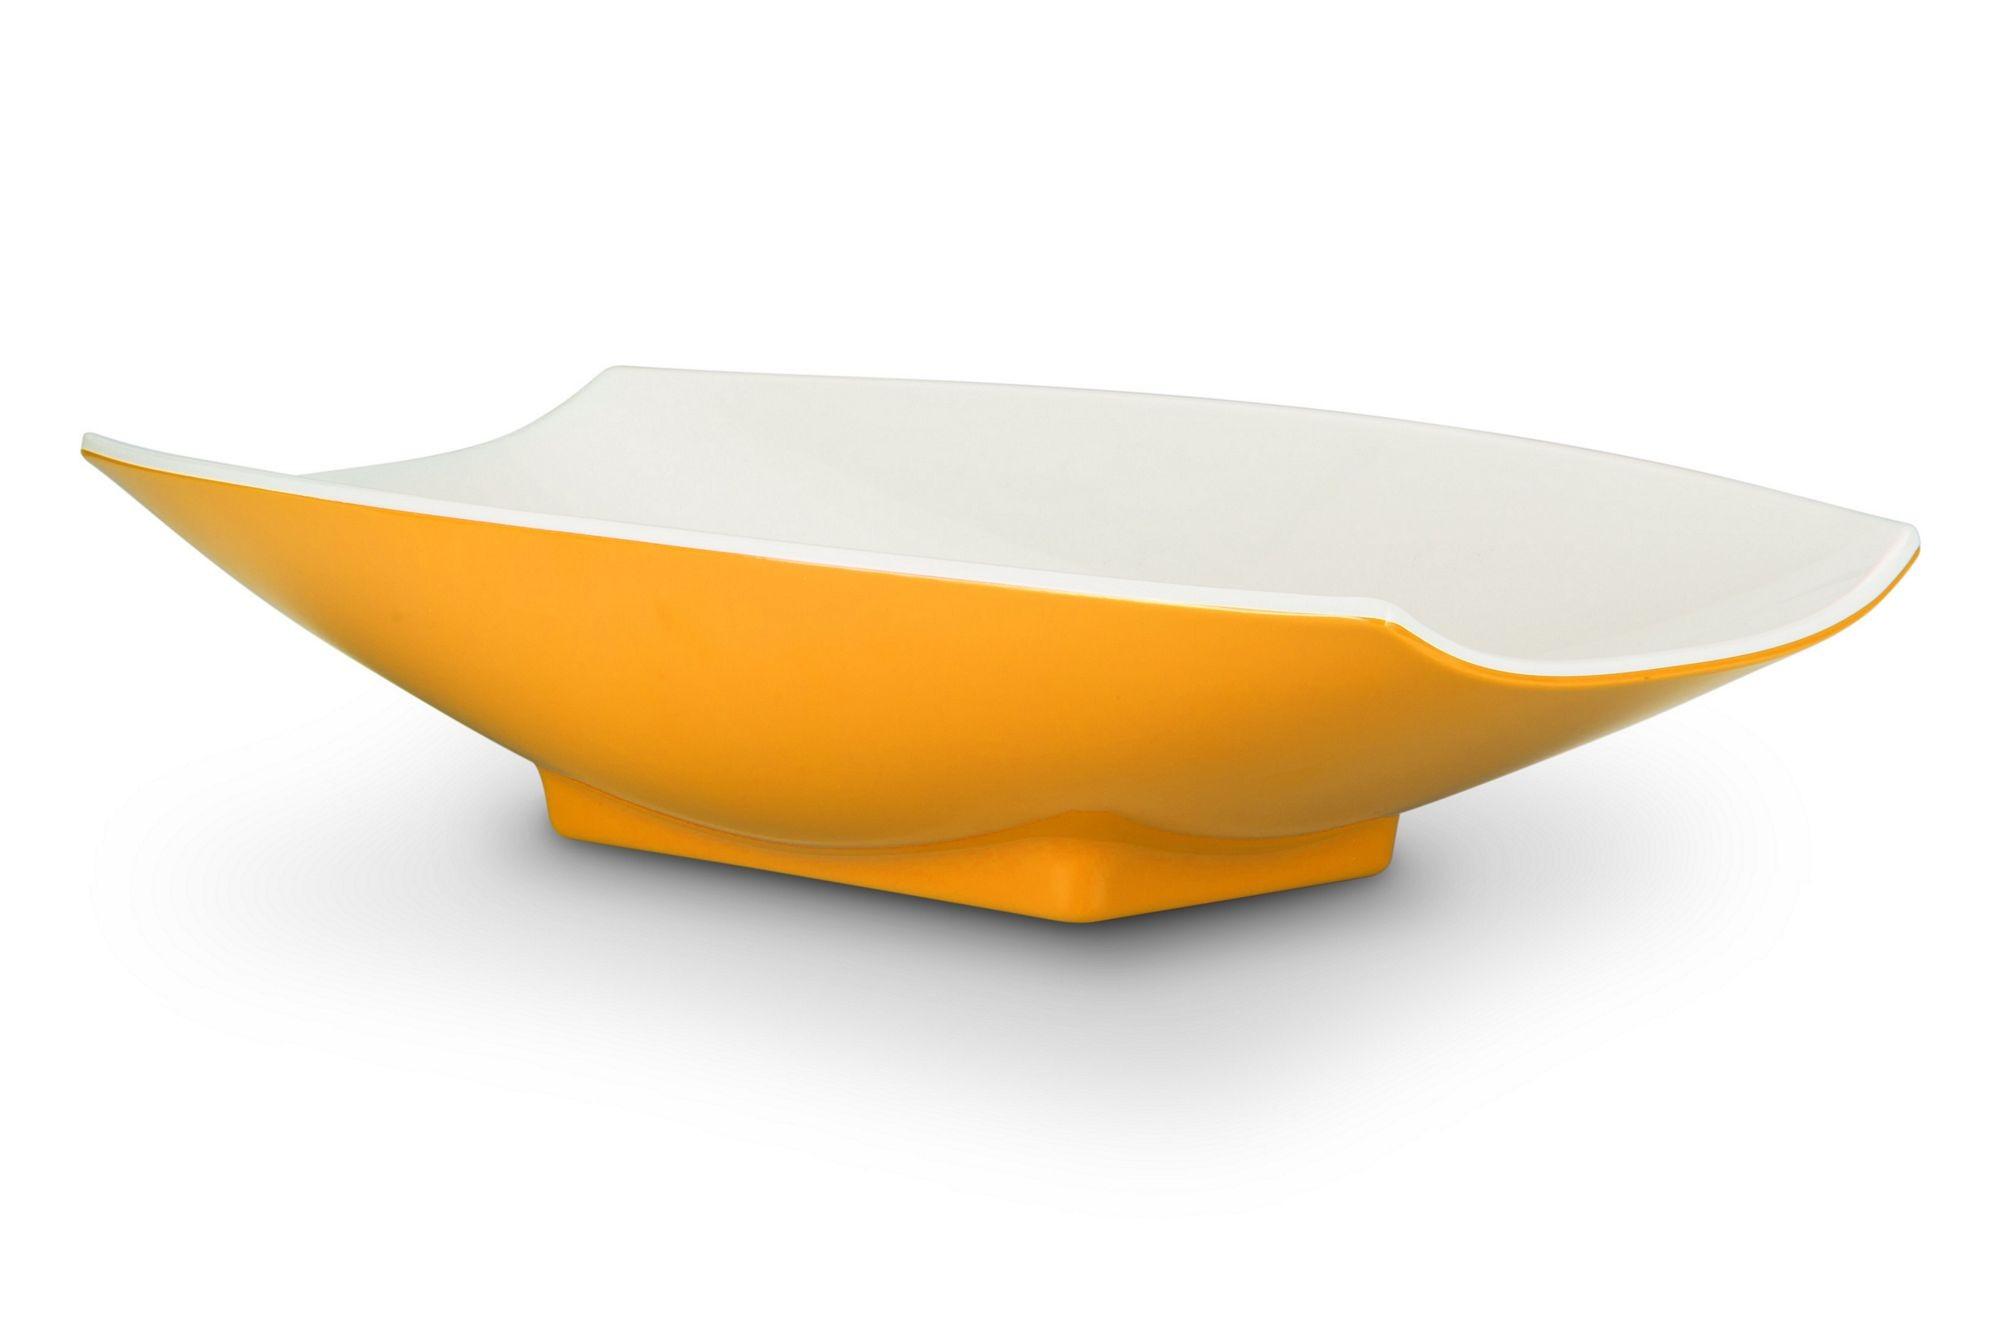 Bon Chef 53705-2ToneYellow Melamine Curves Bowl, Yellow Outside/White Inside 5 Qt.